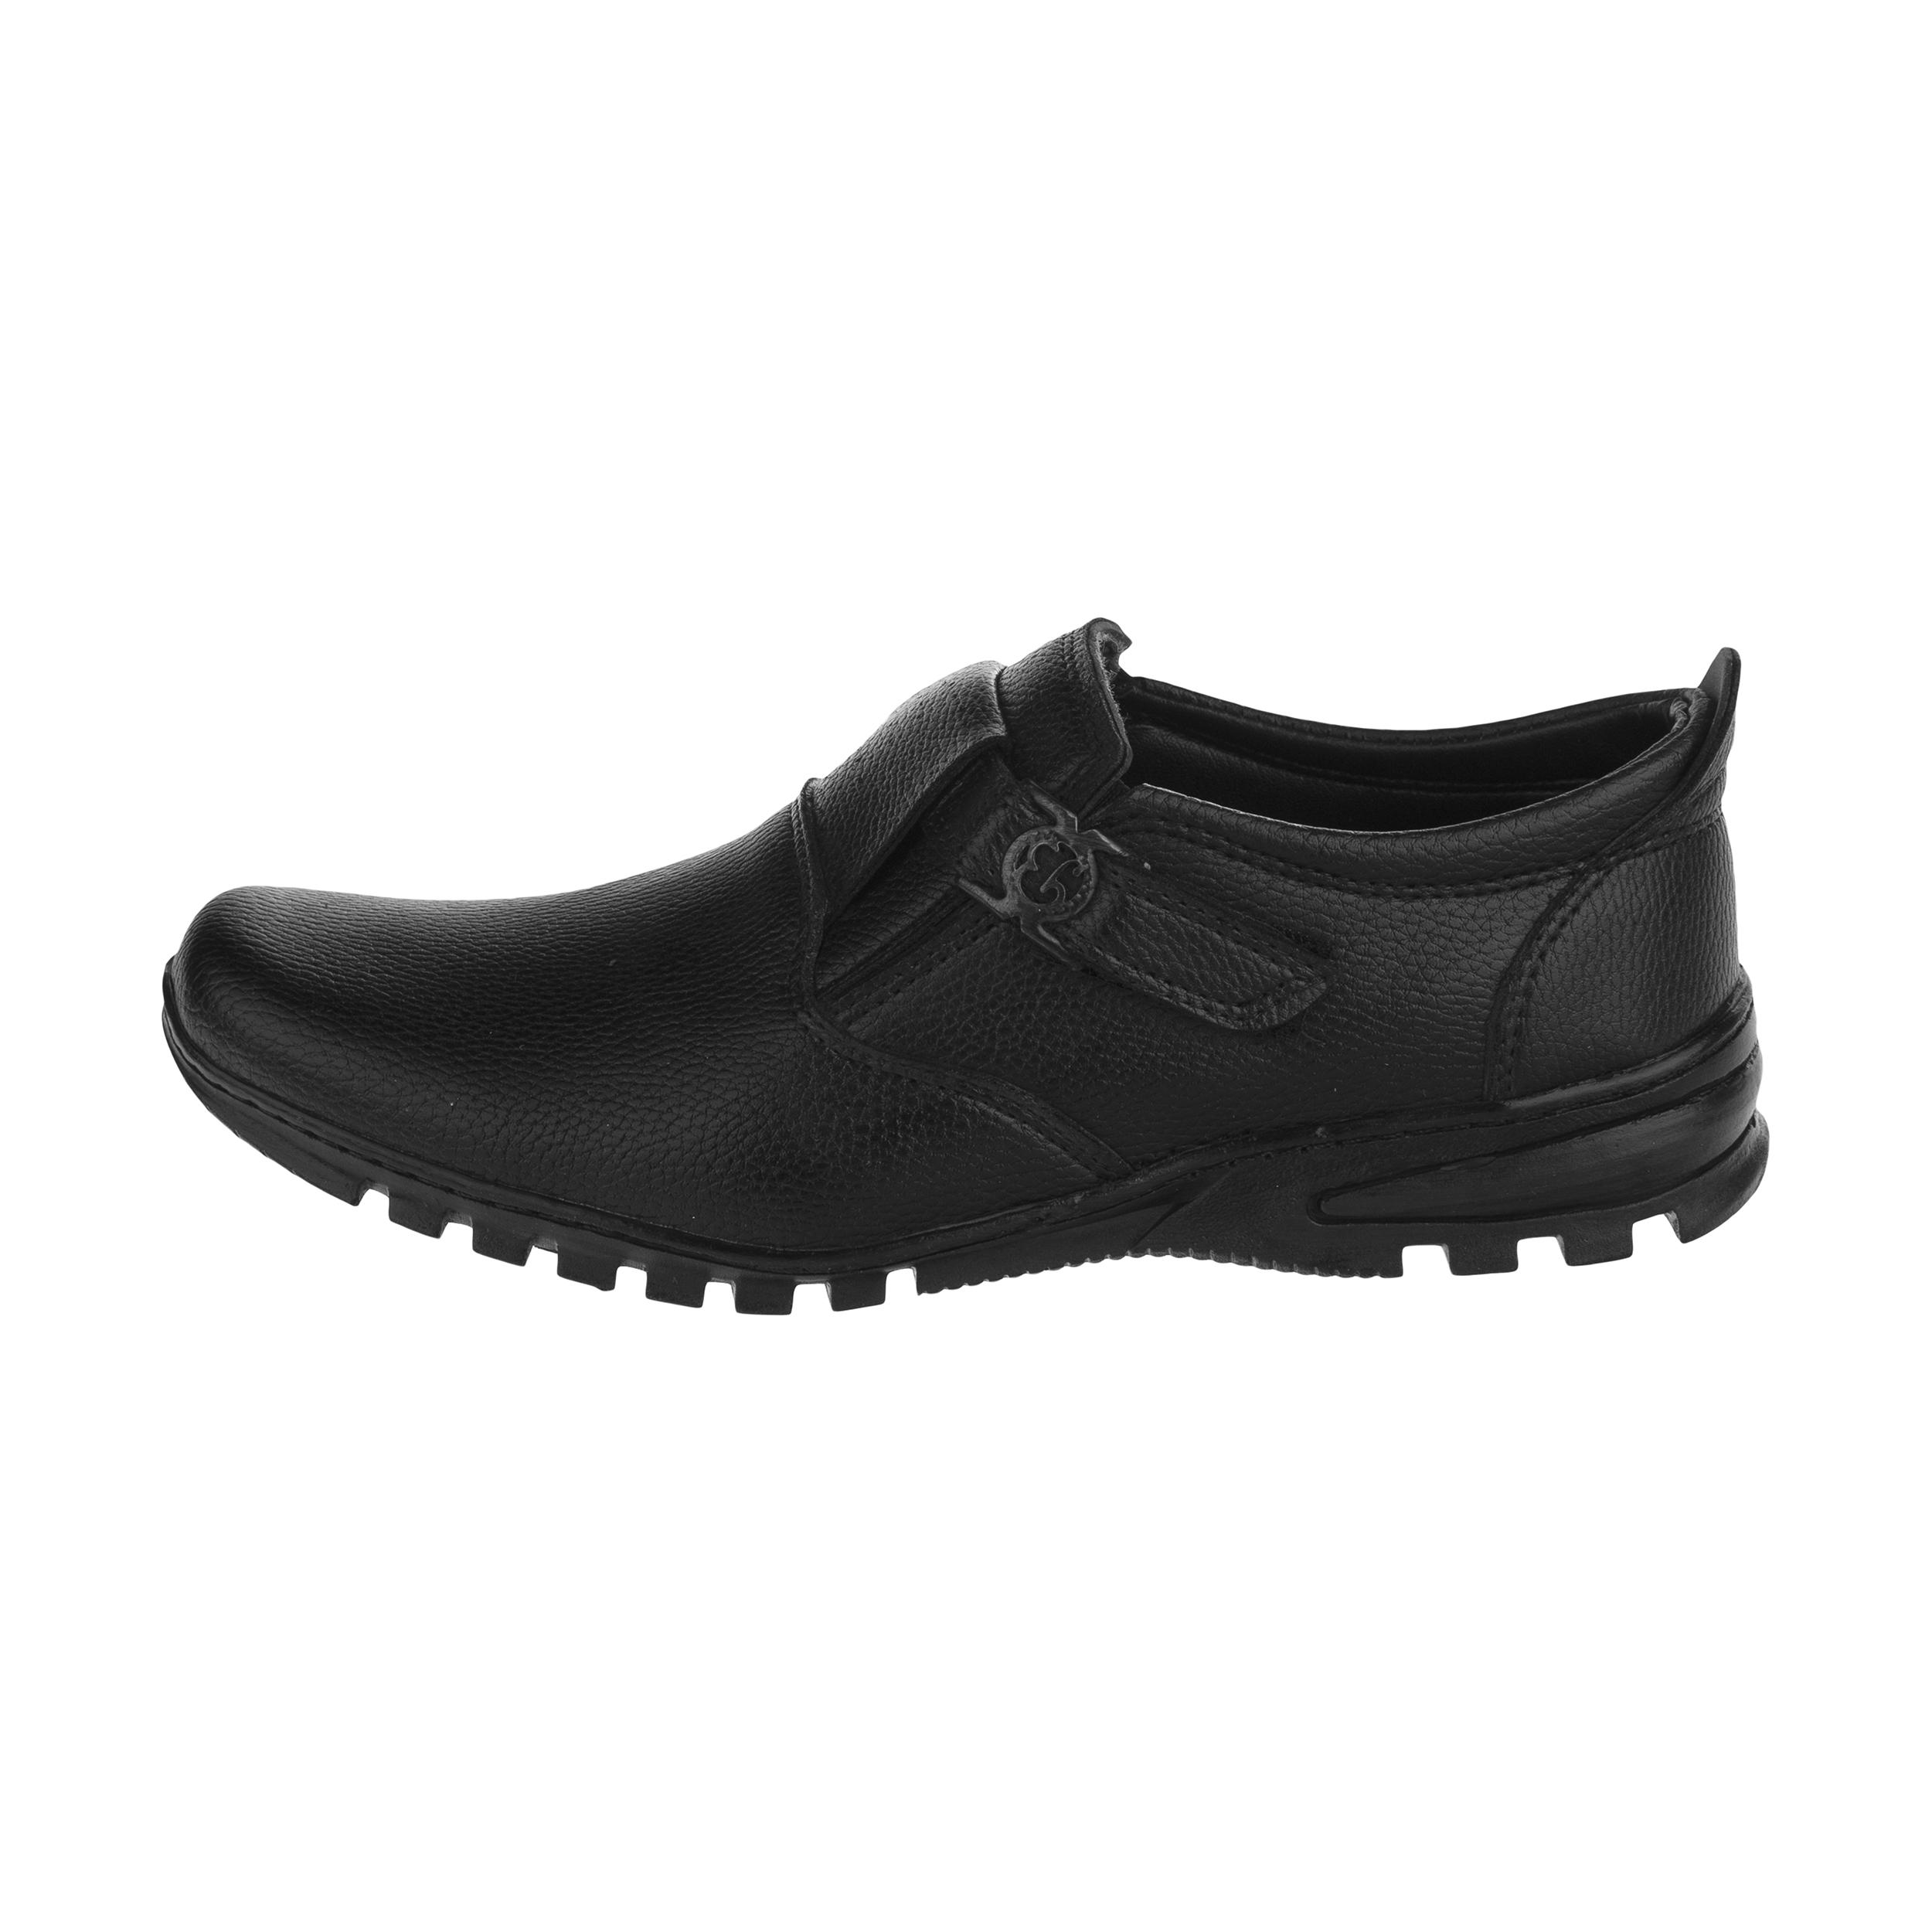 کفش روزمره مردانه مدل k.baz.077